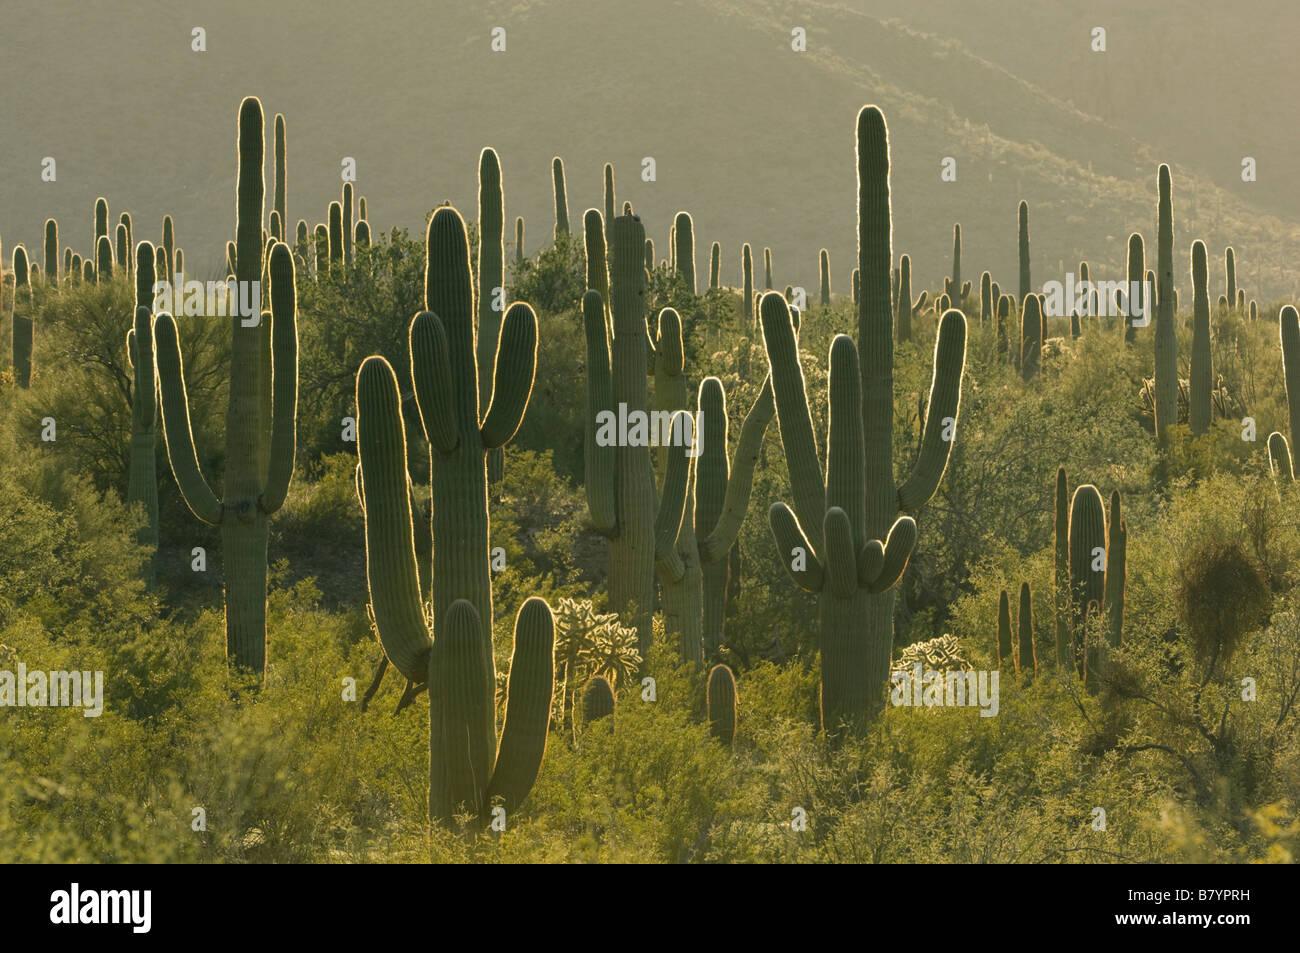 Saguaro Cactus (Carnegiea gigantea) at sunrise, Organ Pipe National Monument, Arizona - Stock Image